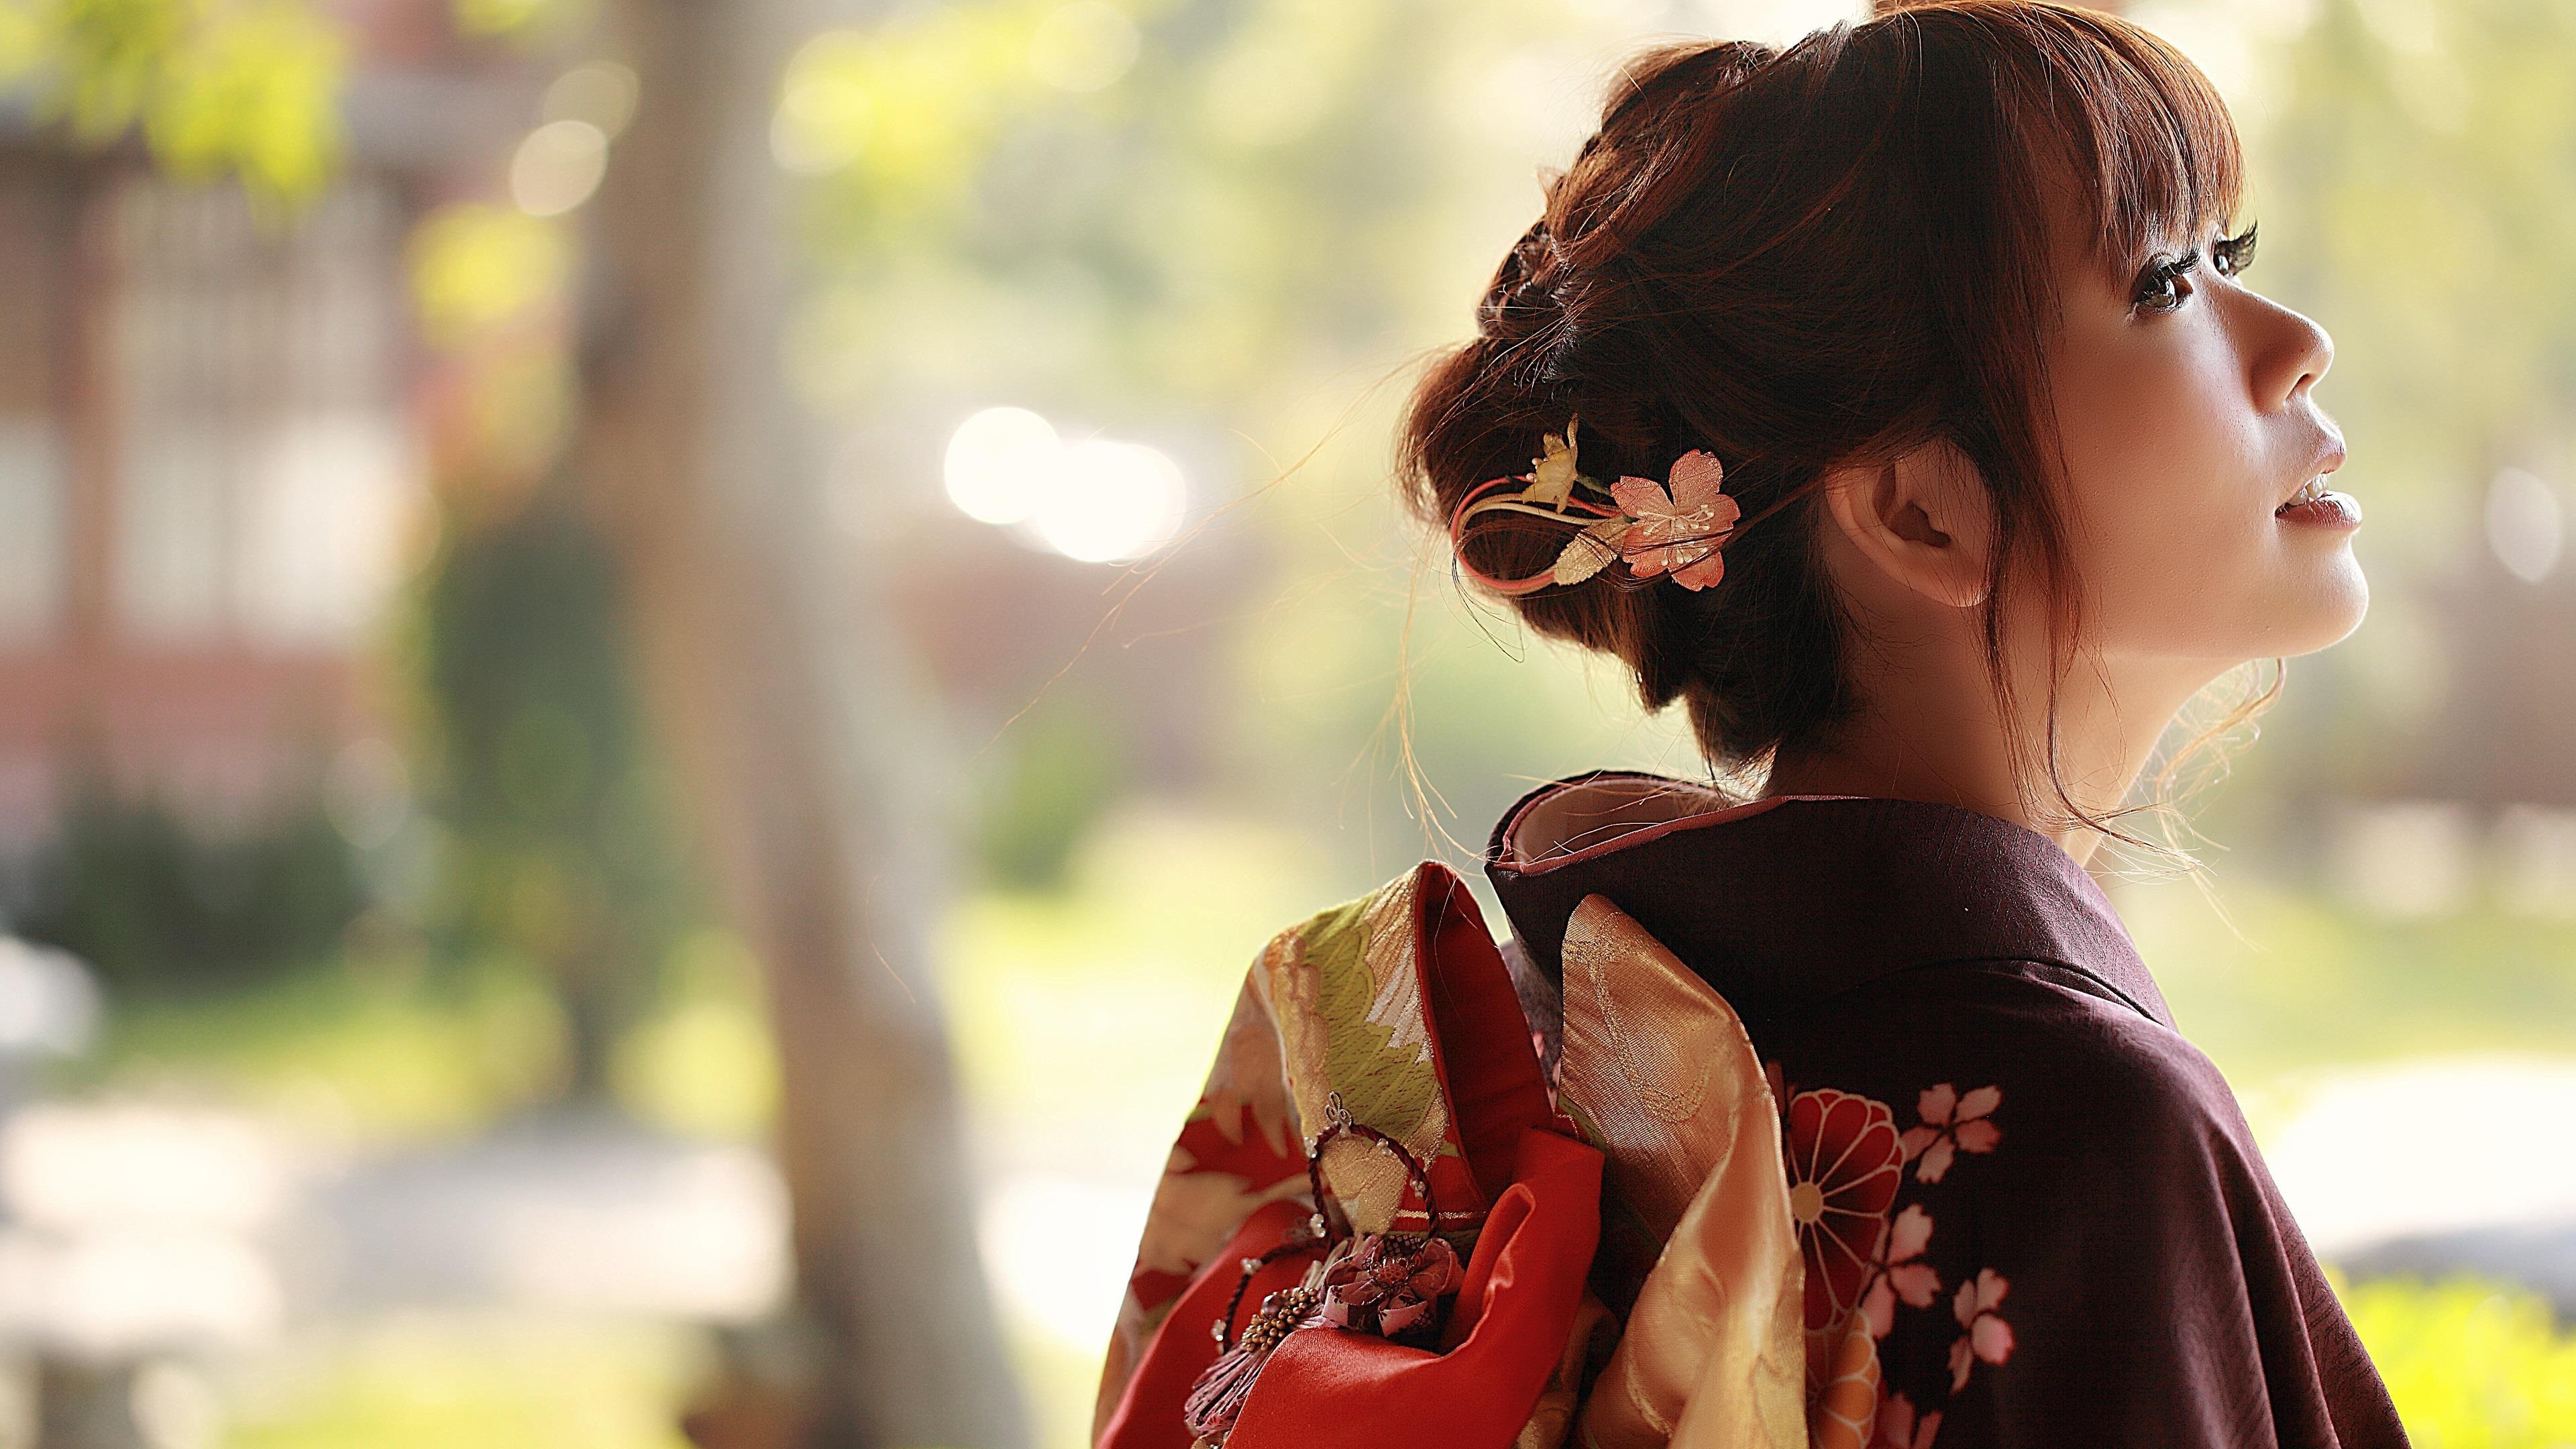 Kimono Wallpaper 75 Pictures